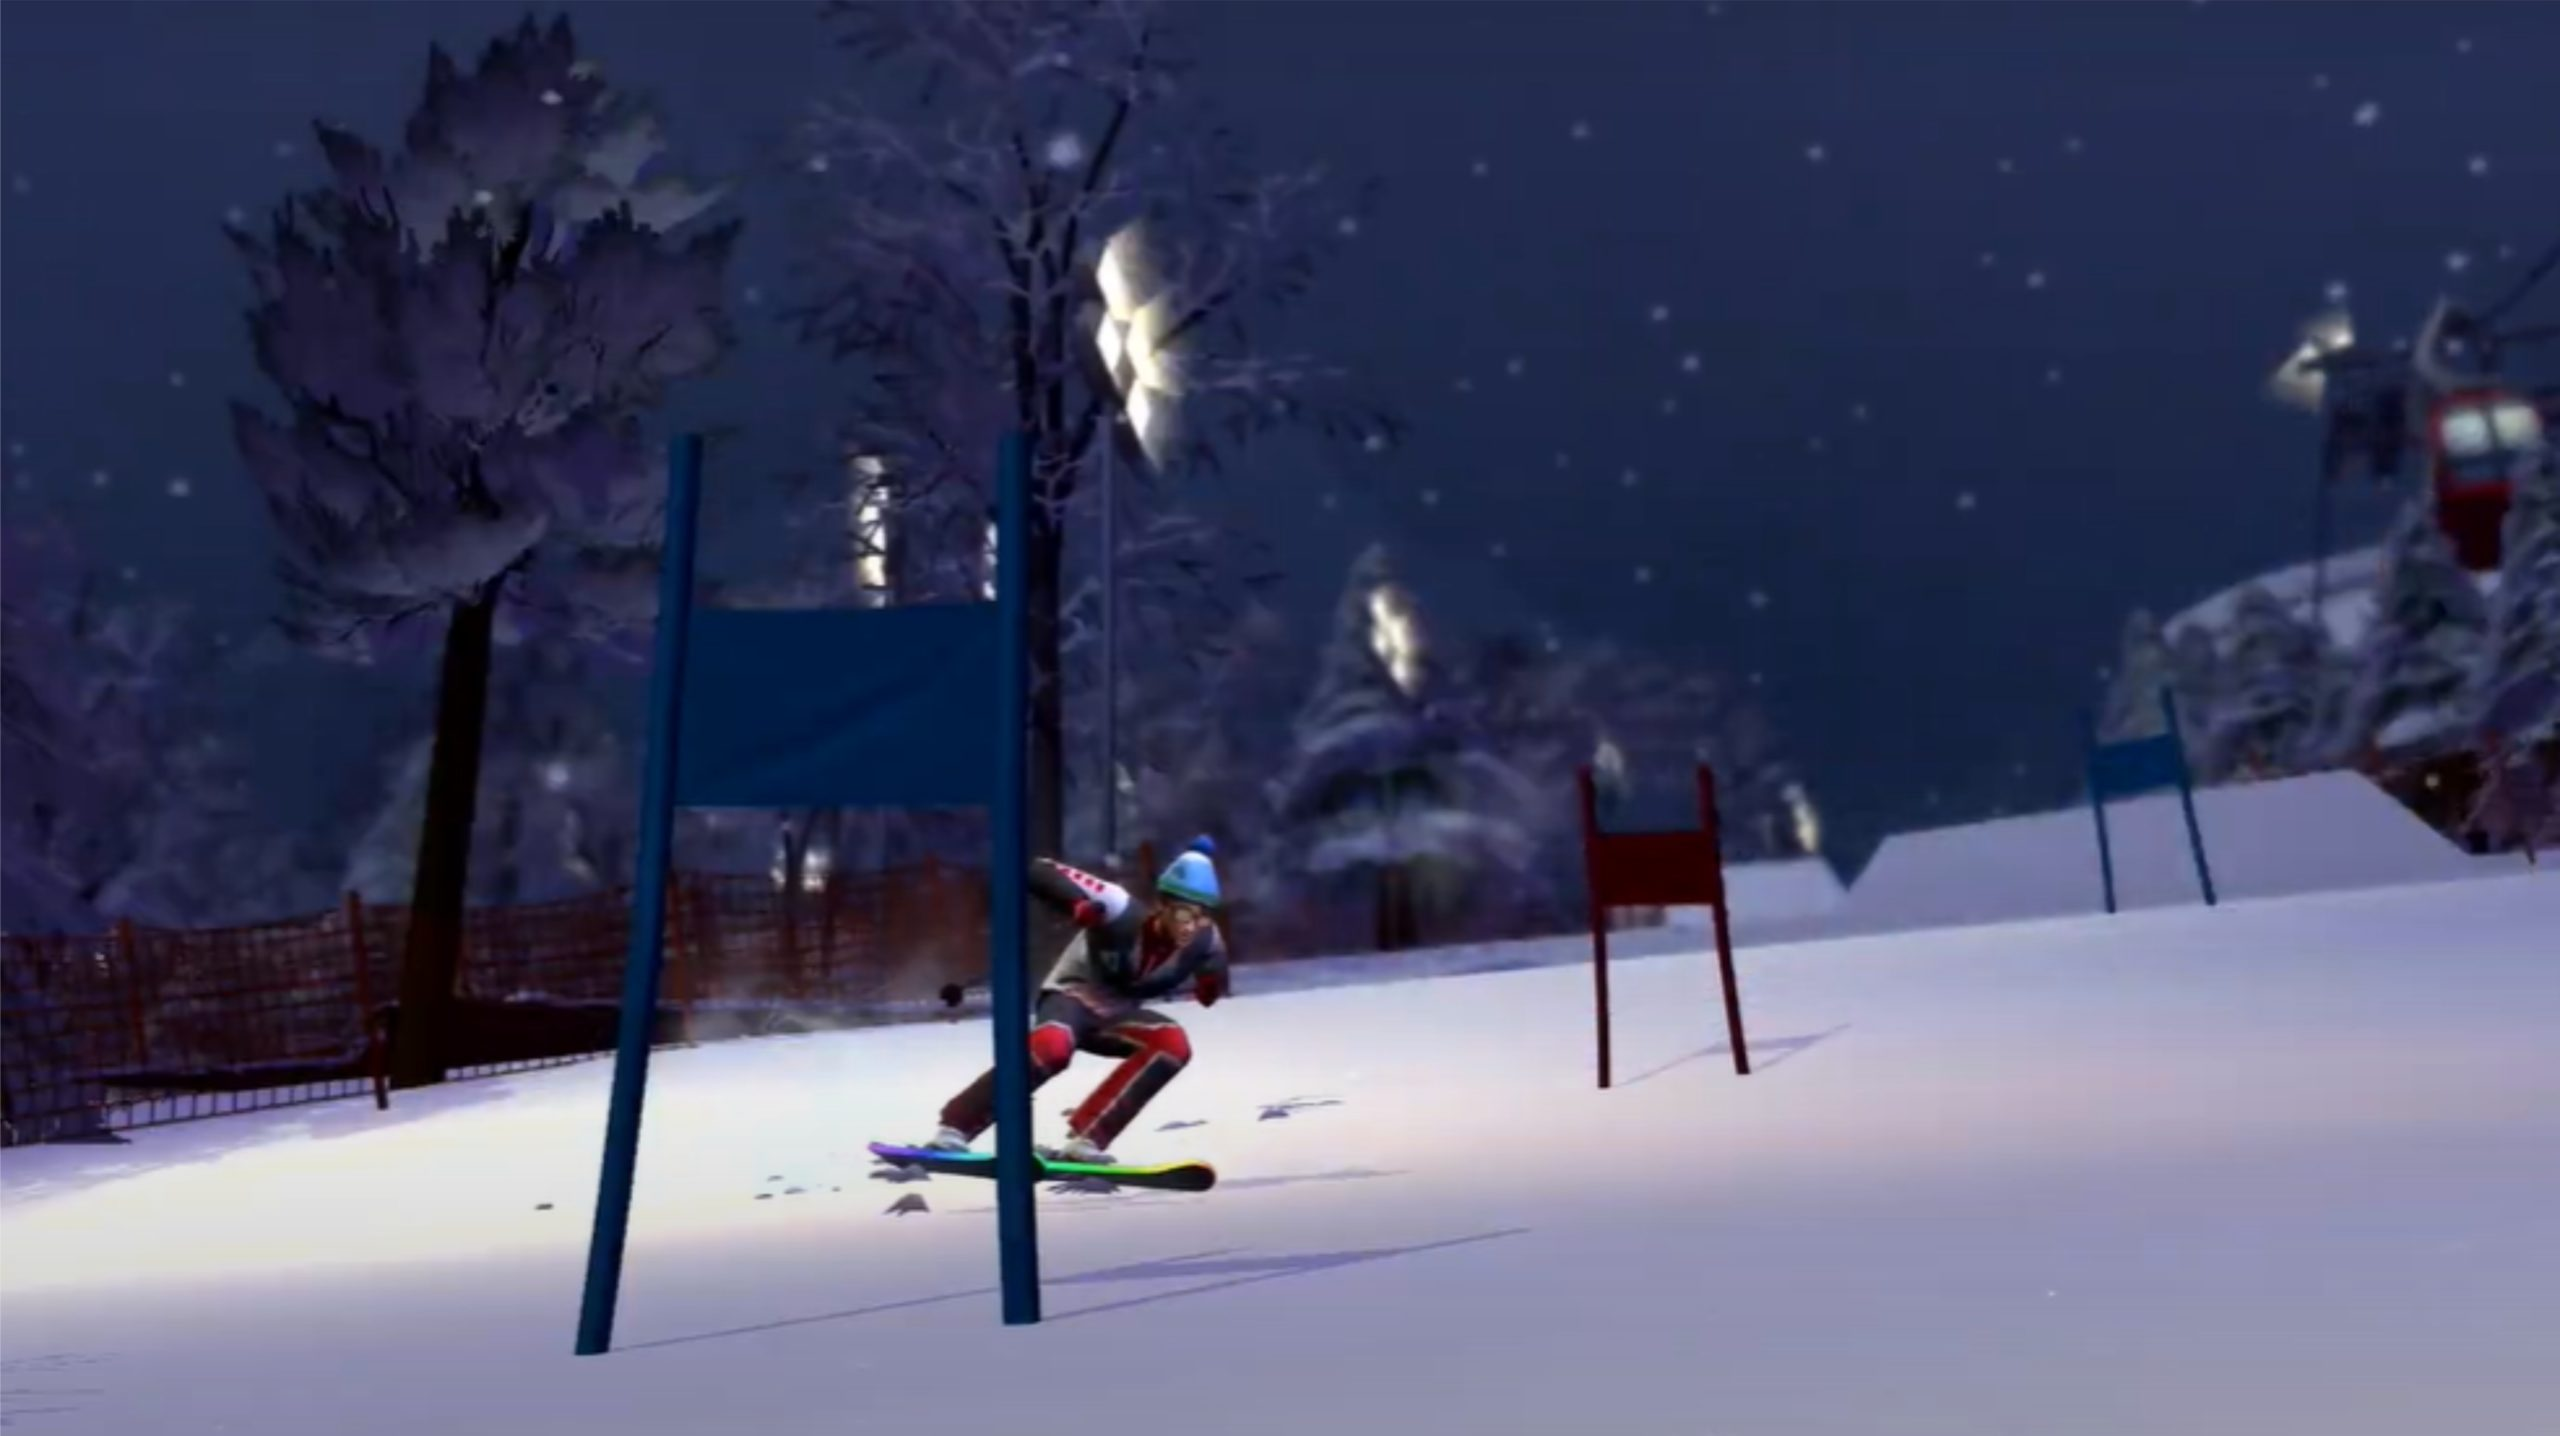 sims 4: escape nevado